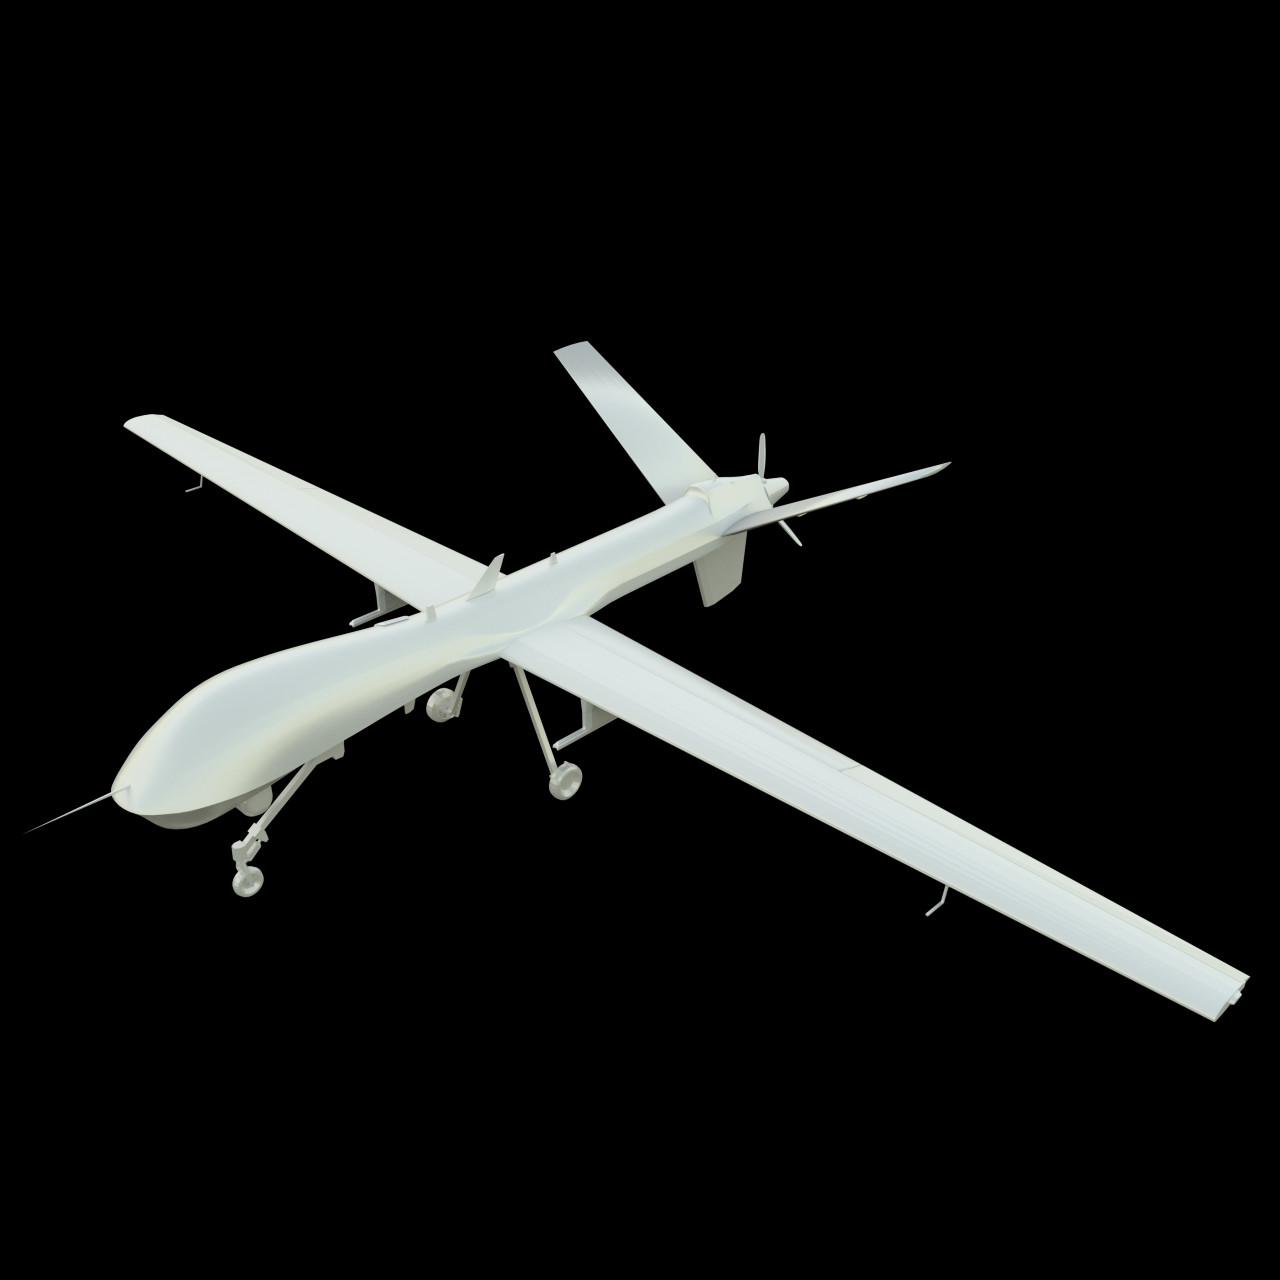 MQ-9-Reaper-UAV-Drone---Screen-00.png